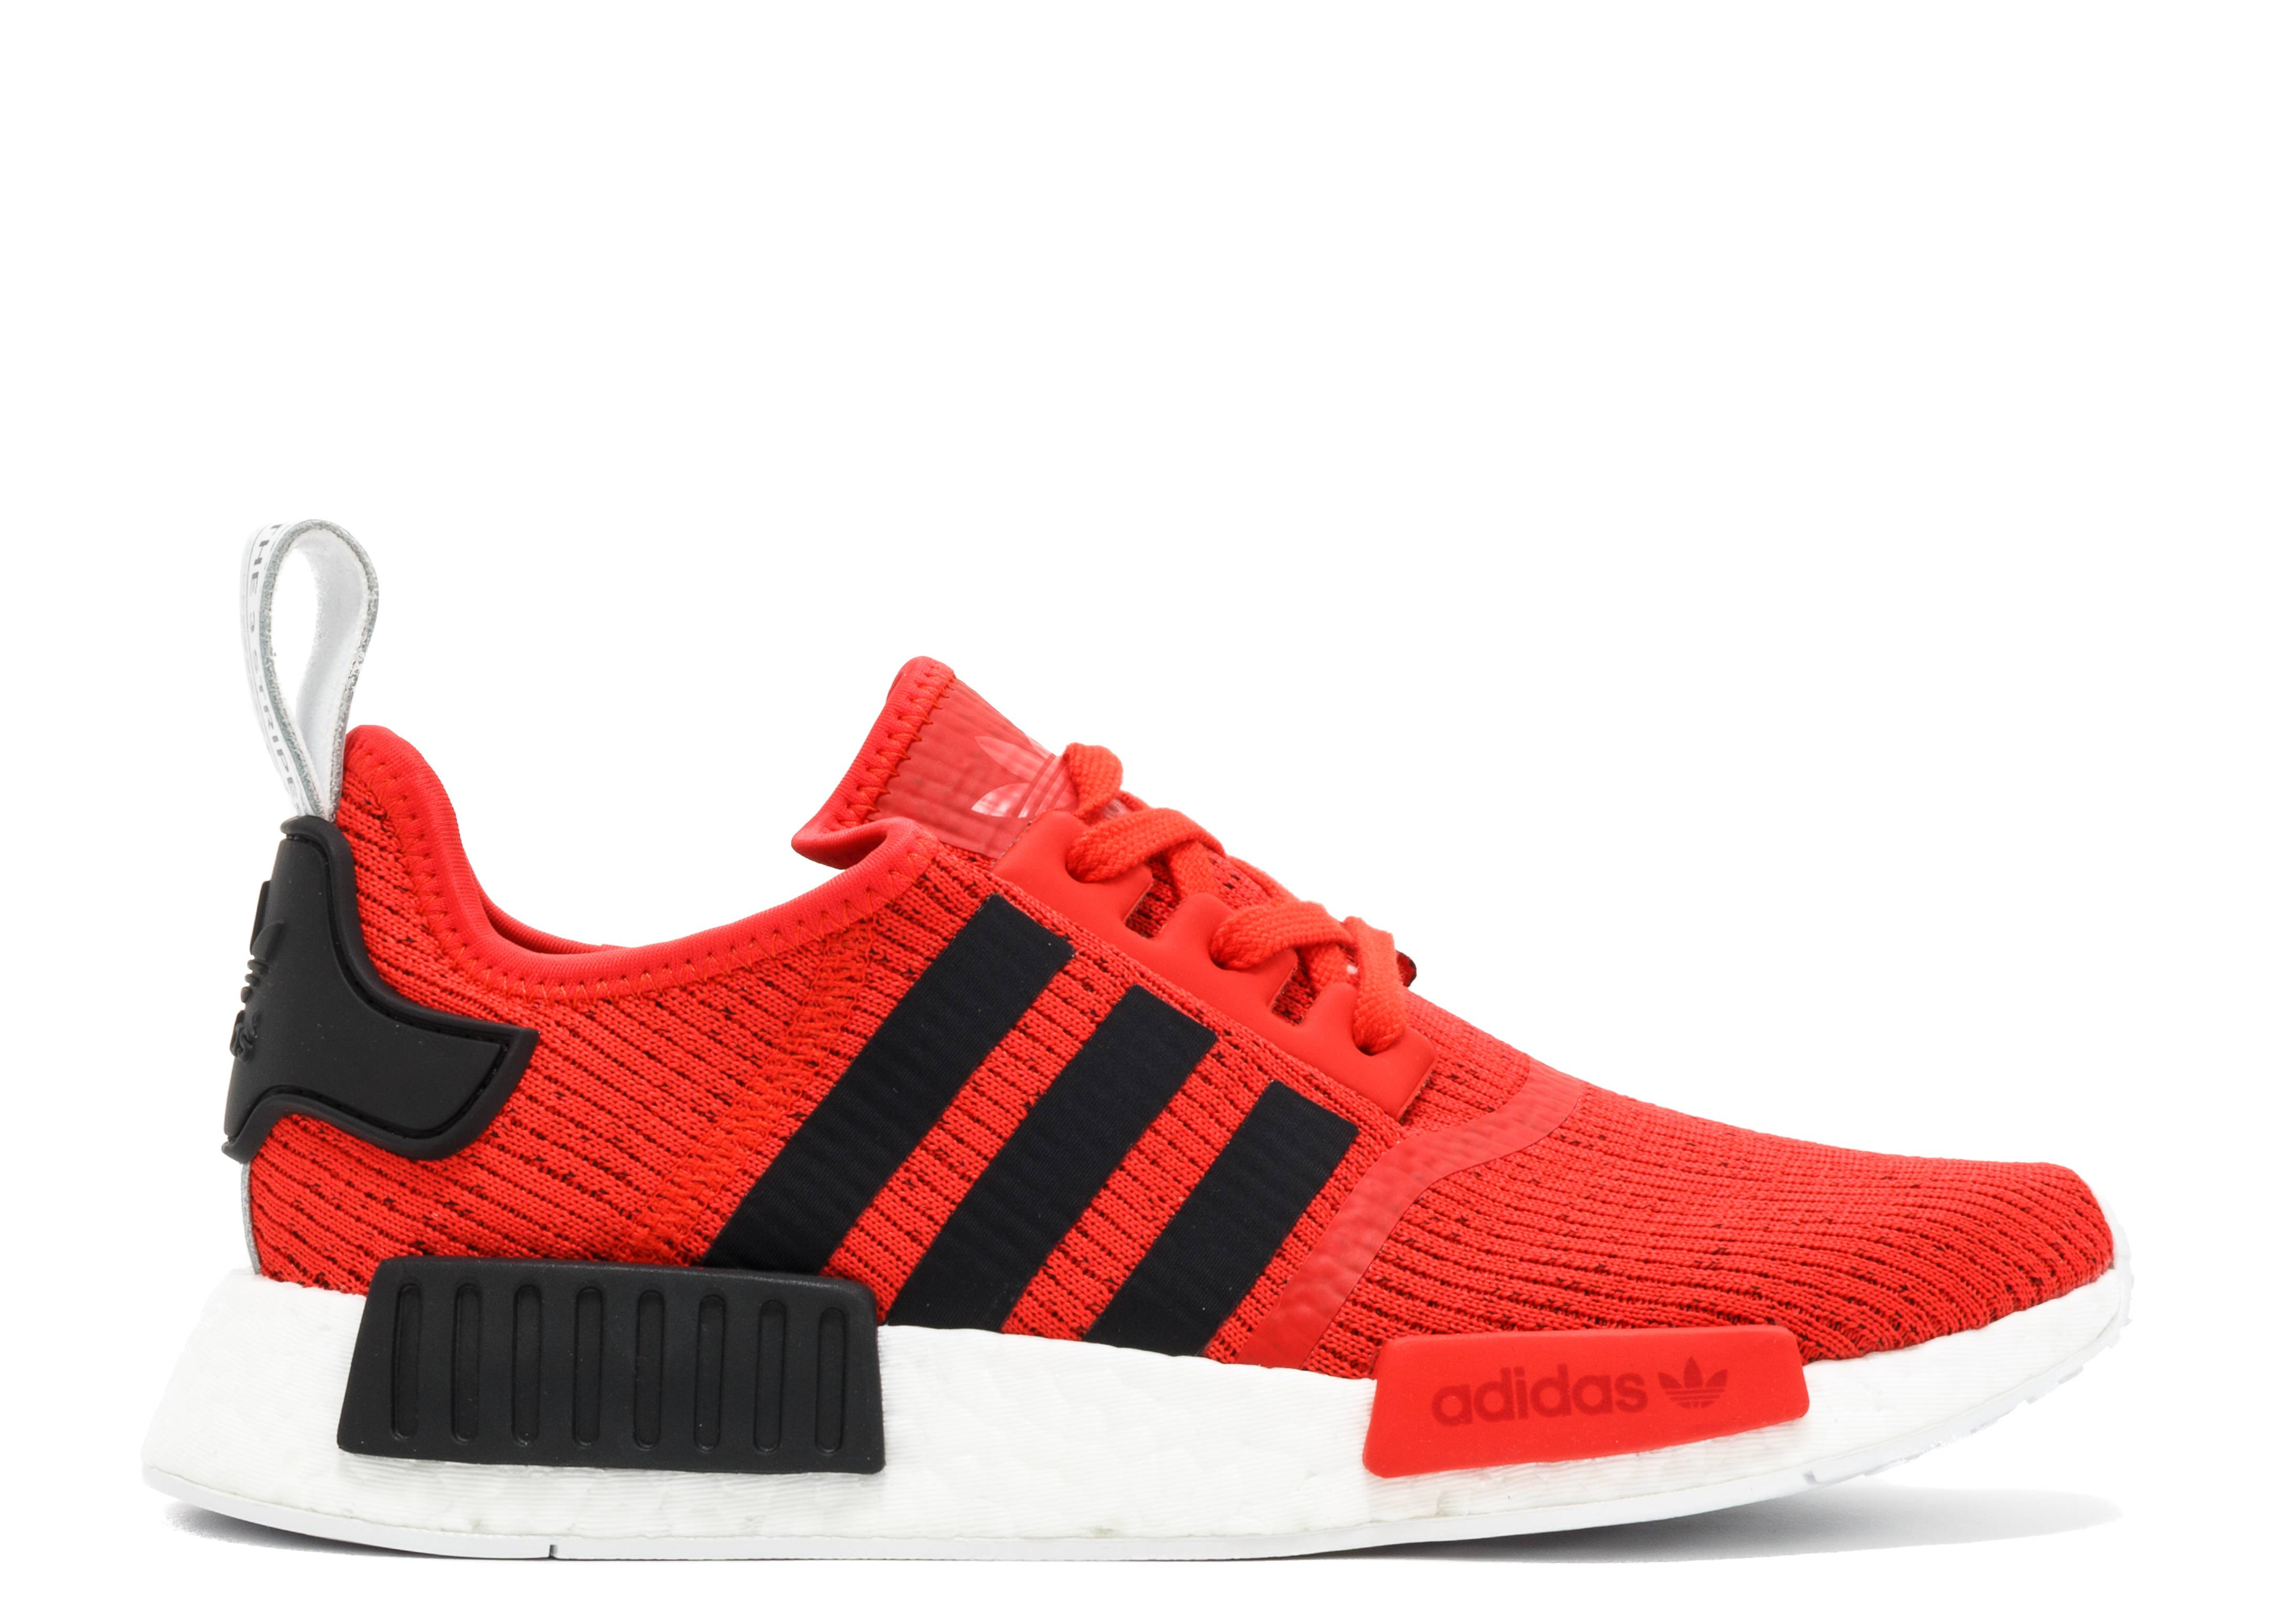 5ff5642440a2 NMD R1 - Adidas - BB2885 - red black